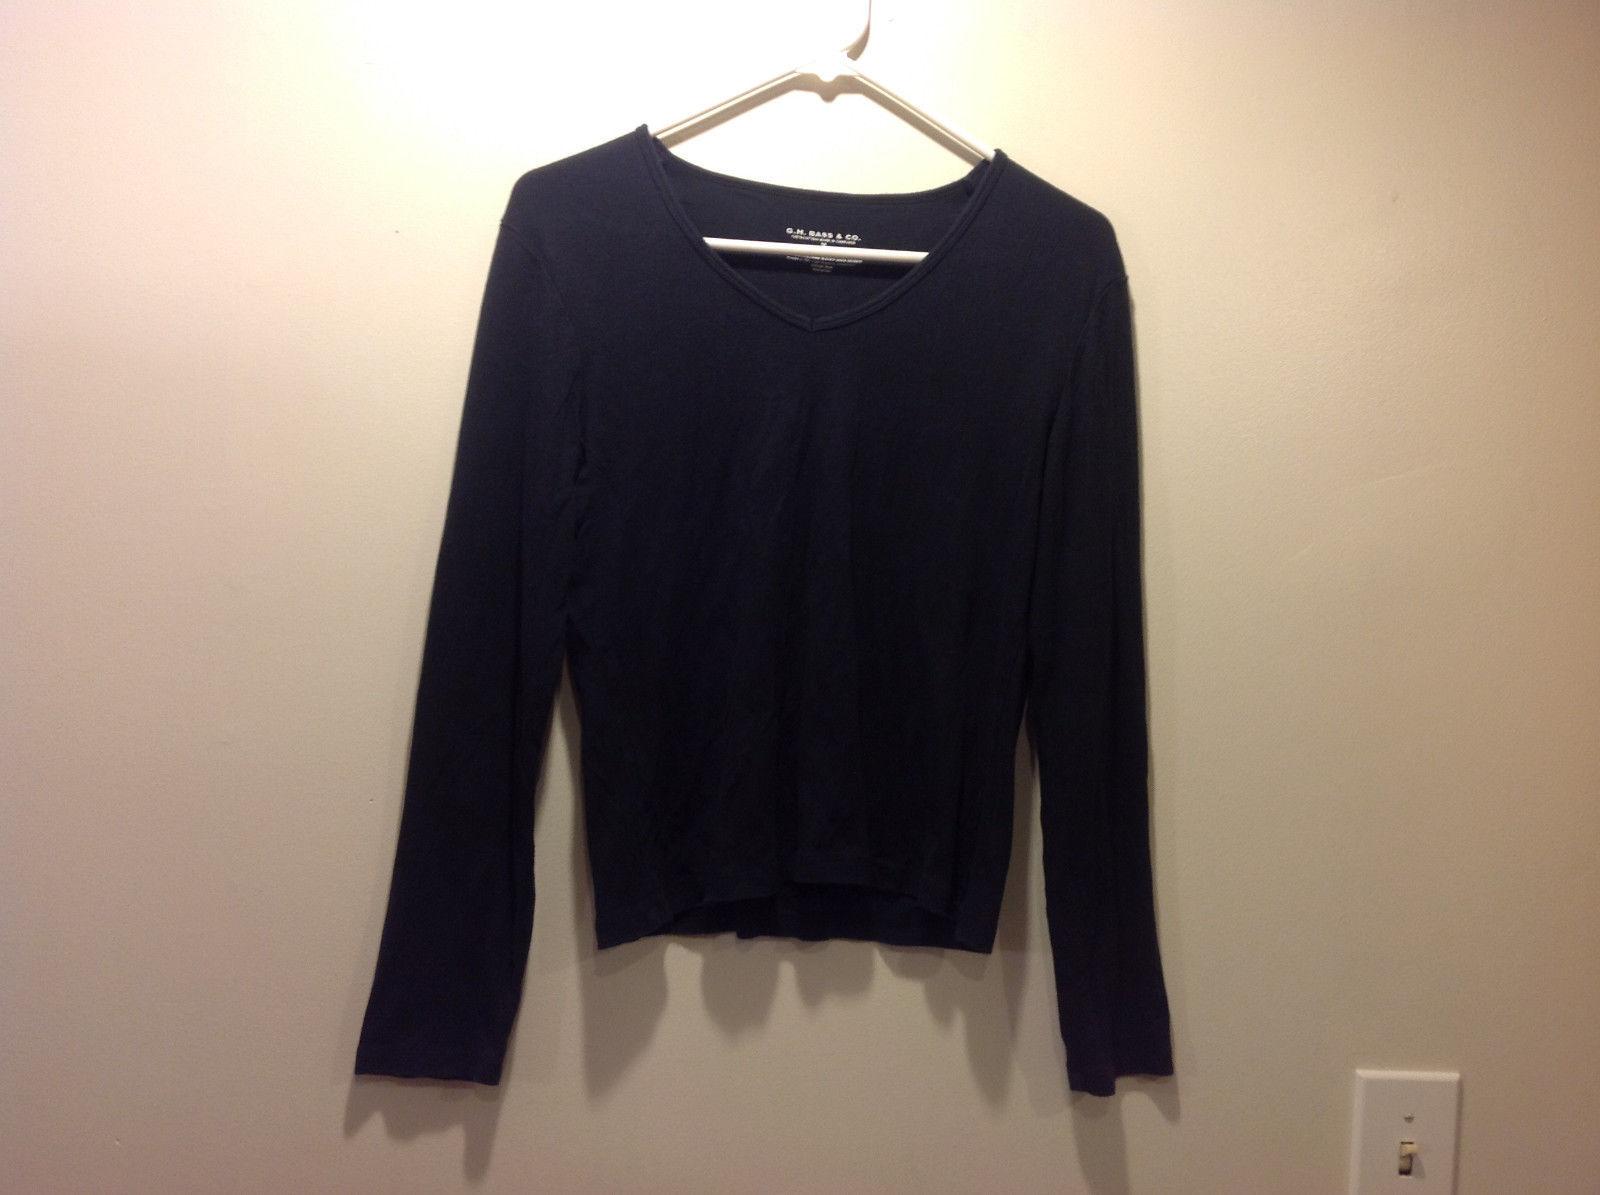 G.H. Bass & CO. Black long sleeve shirt